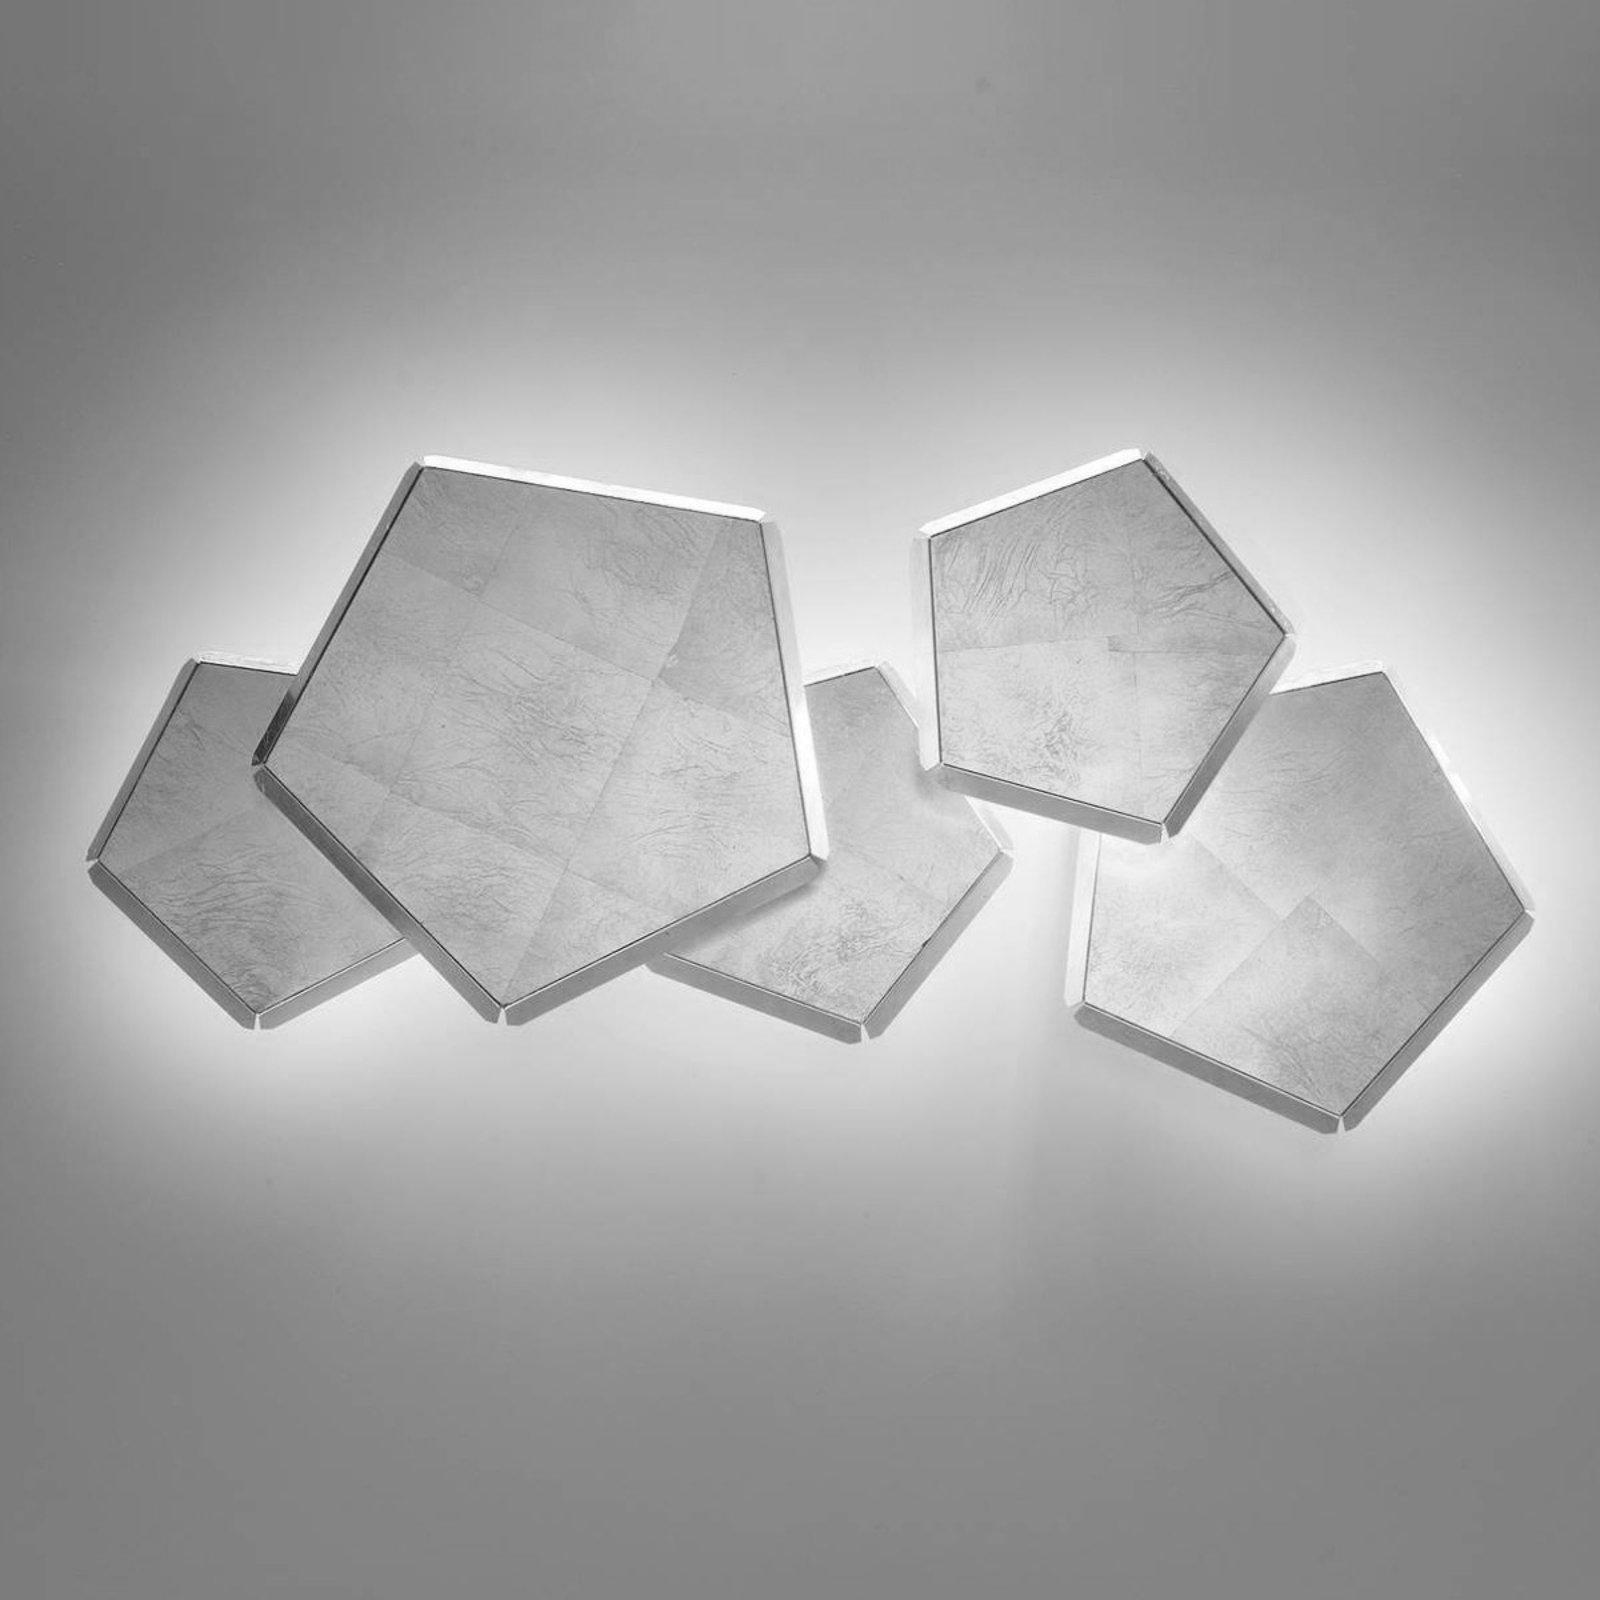 LED-vegglampe Pleiadi med sølvblad, 5 lyskilder